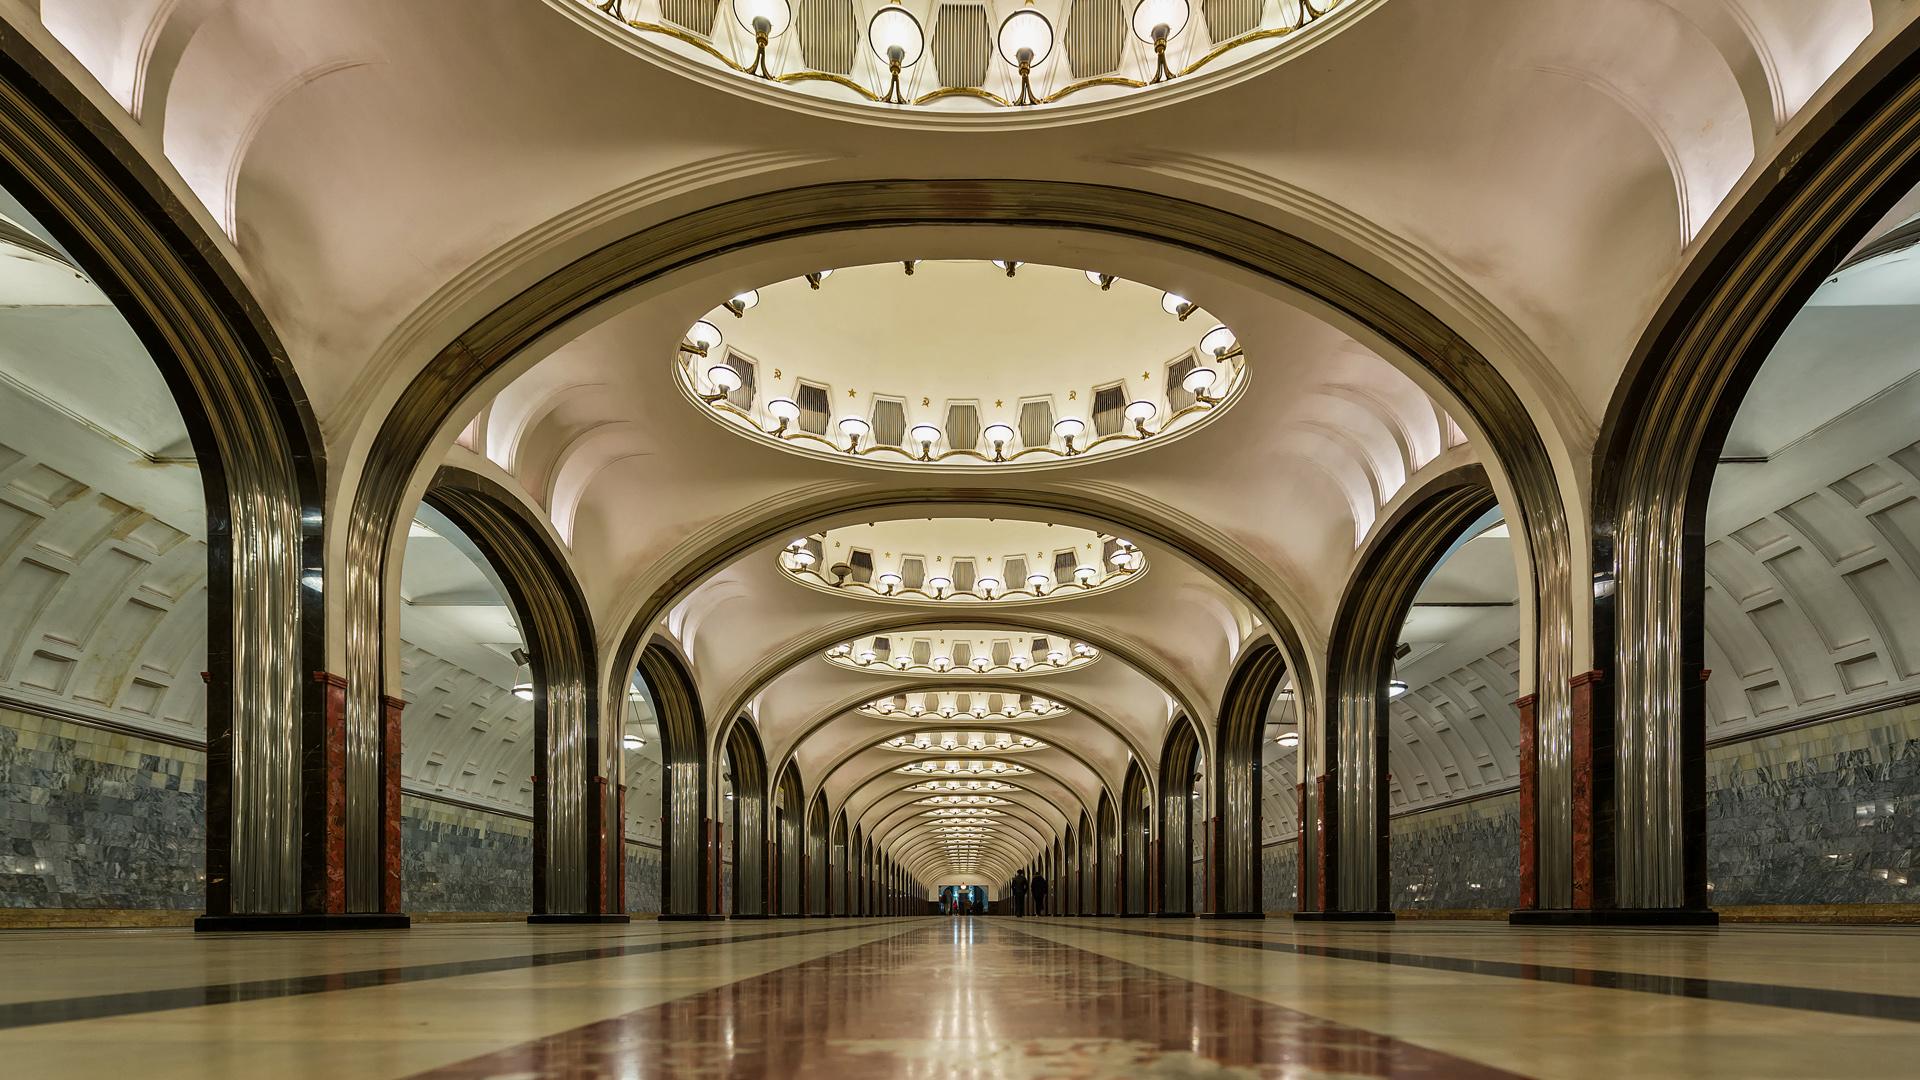 mayakovskaya moscow metro station belles id es de design de maison. Black Bedroom Furniture Sets. Home Design Ideas